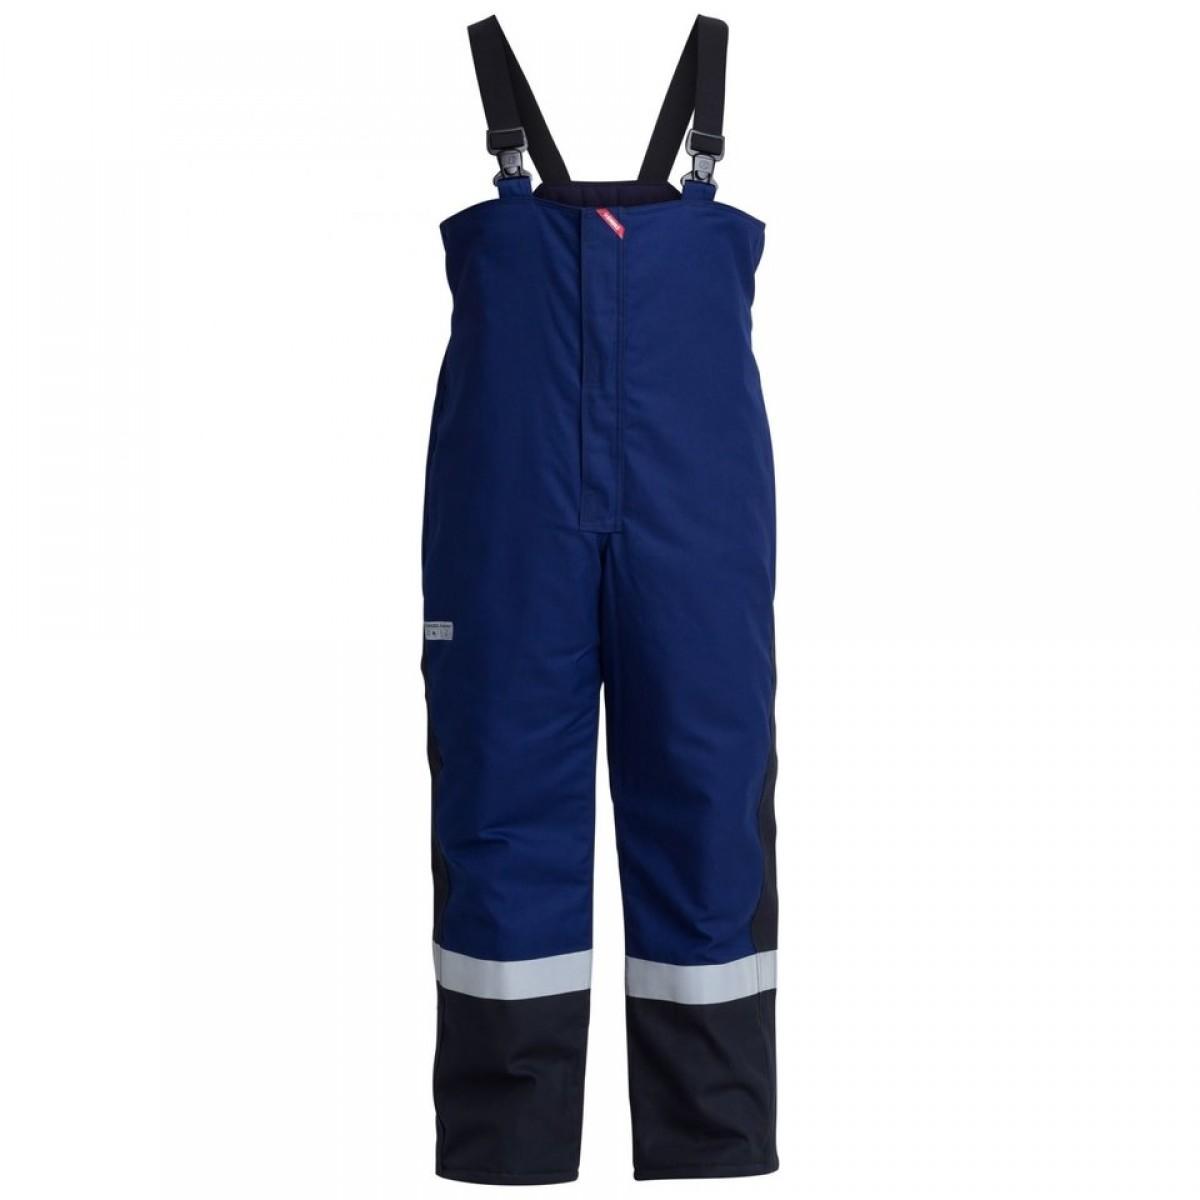 F. Engel Safety+ Vinteroverall-31